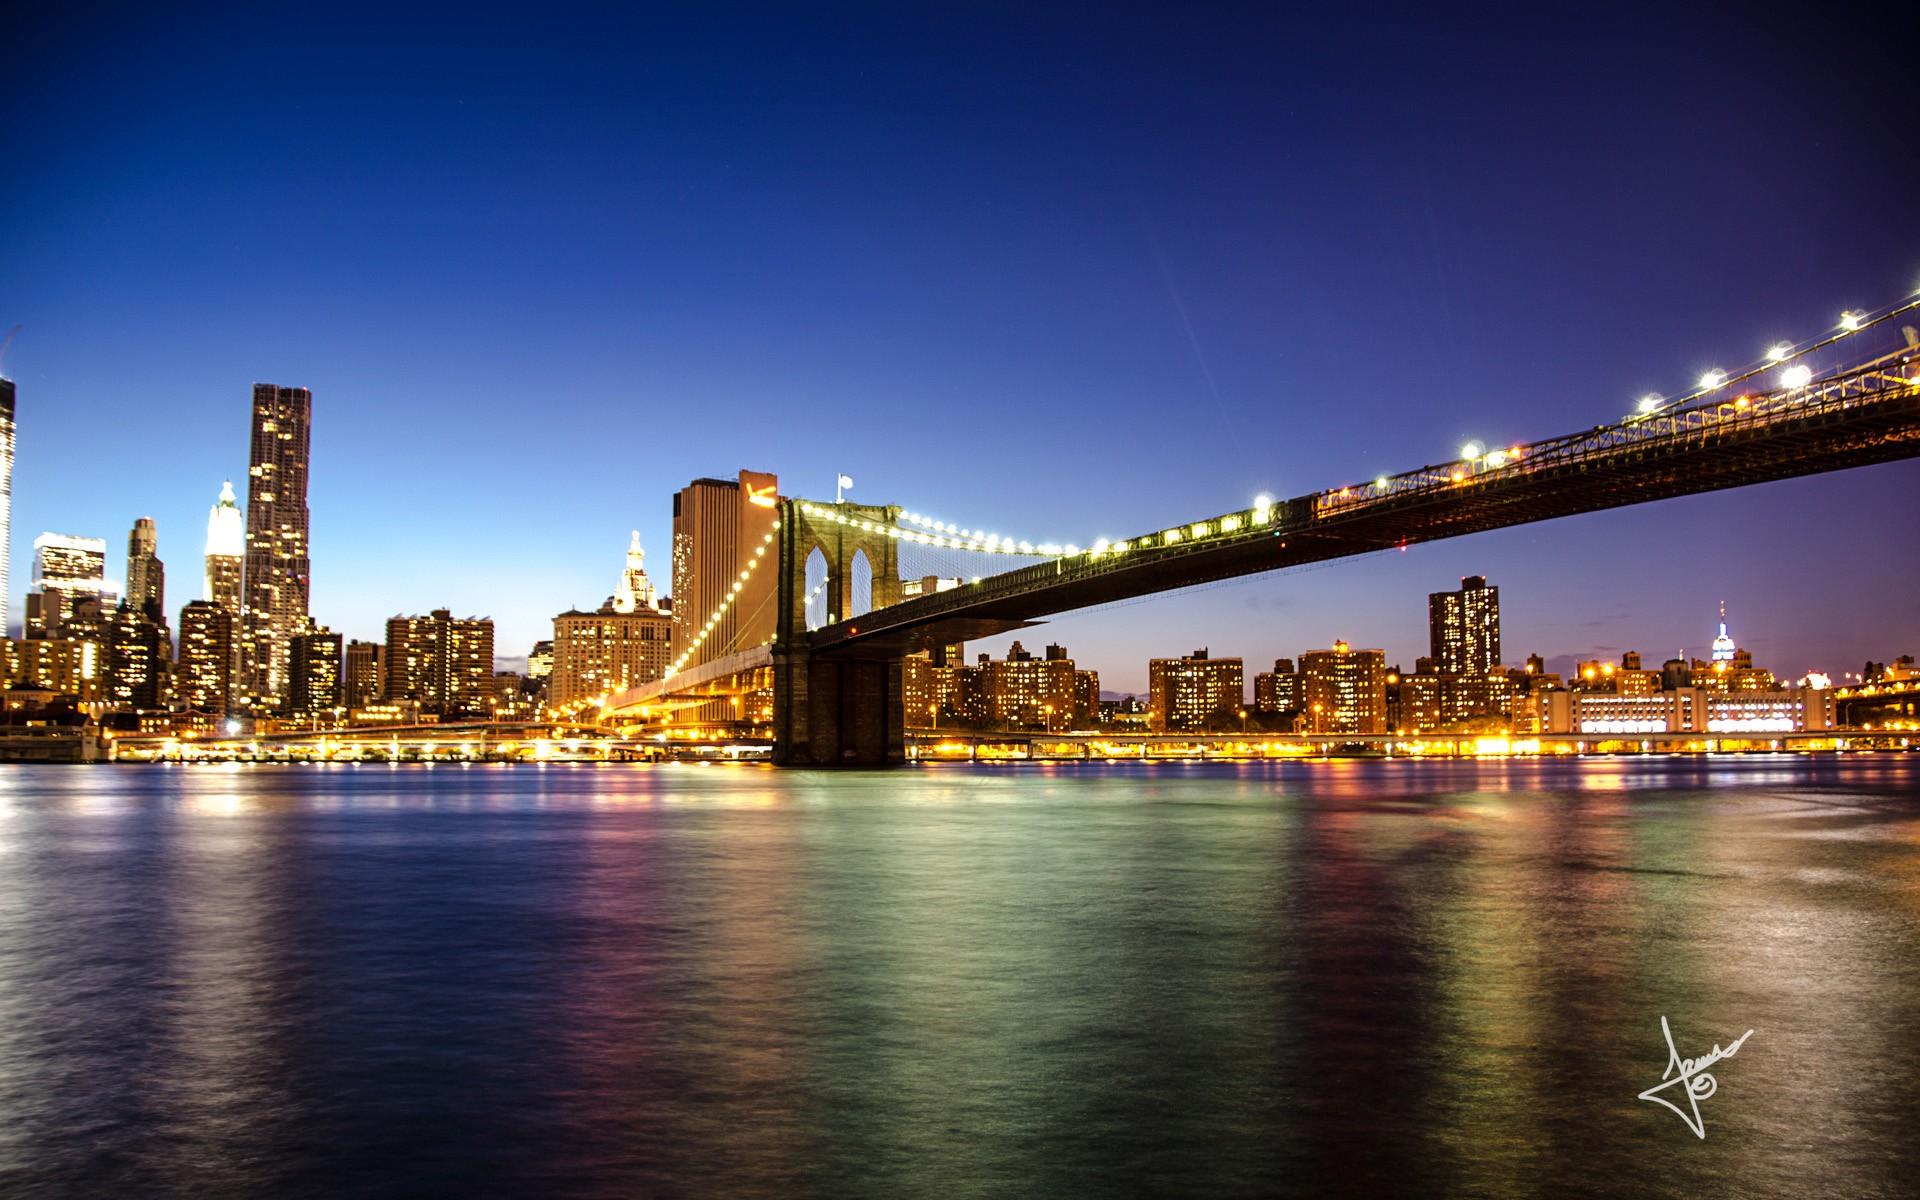 New York Iphone Wallpaper Brooklyn Bridge New York Wallpapers Hd Wallpapers Id